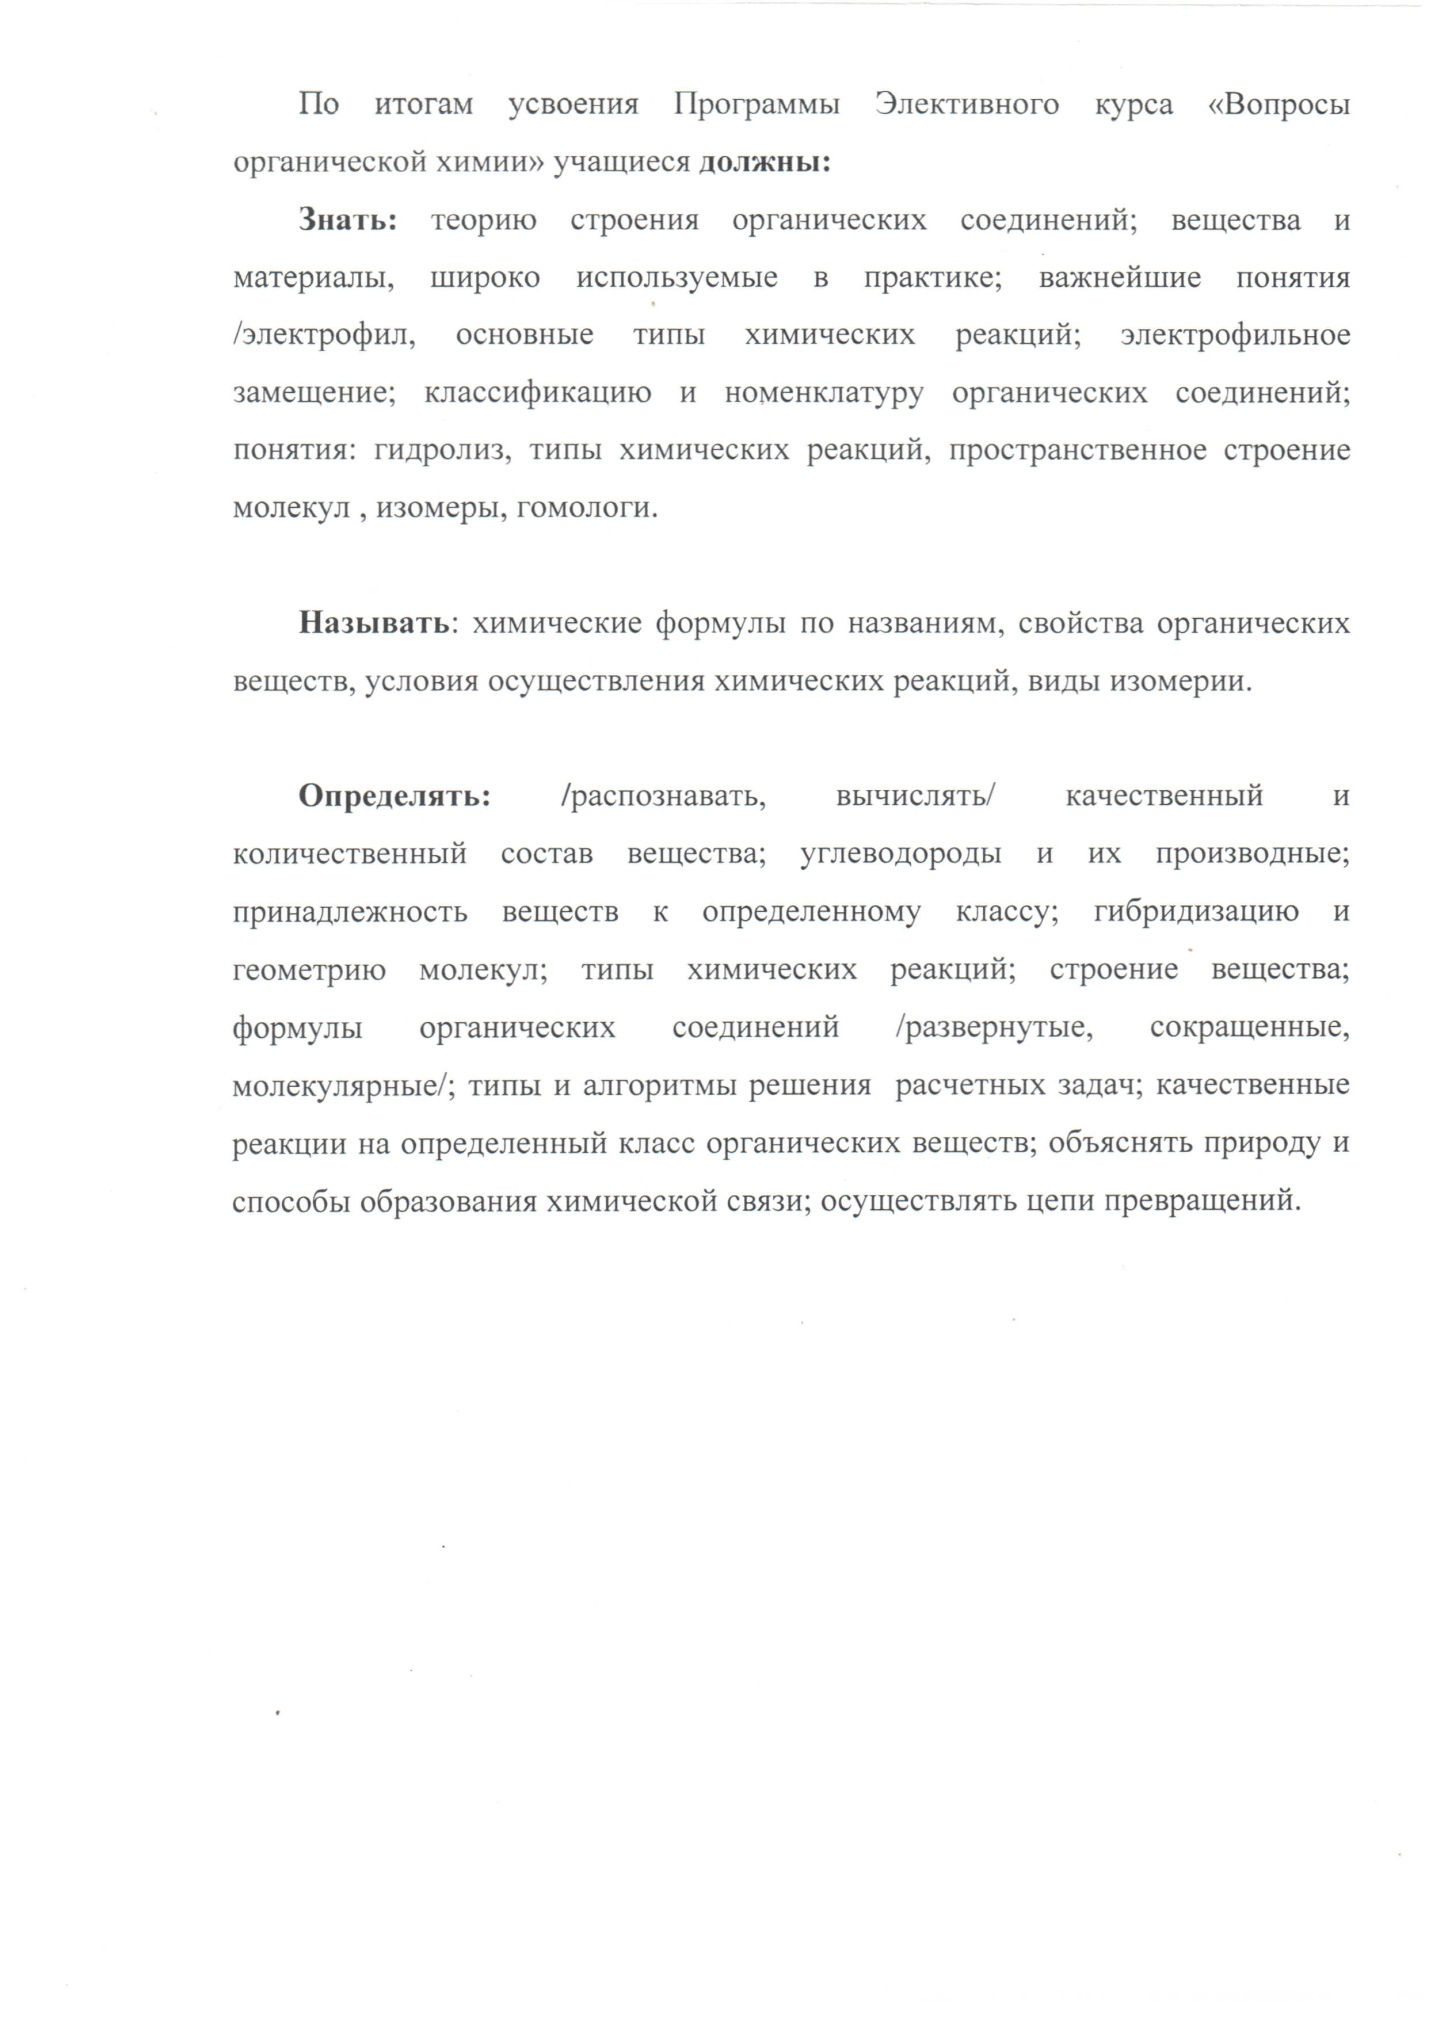 C:\Users\Леха\Desktop\м.и\7.jpg